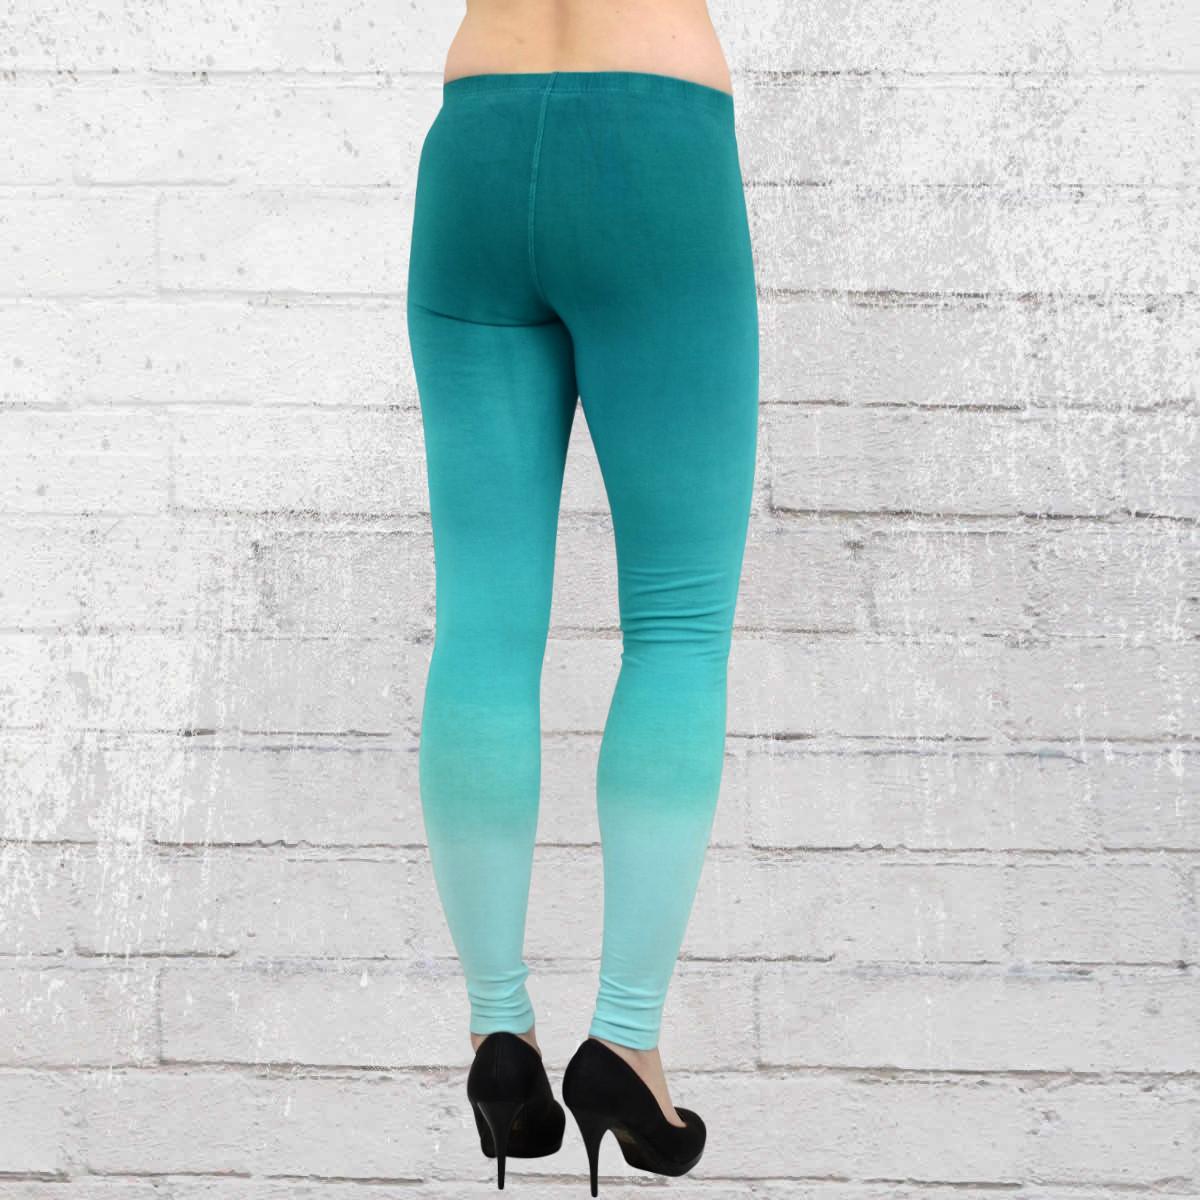 b12e155d305f Label 23 Ladies Leggings Pants Sport IN2ID3 black pink 34